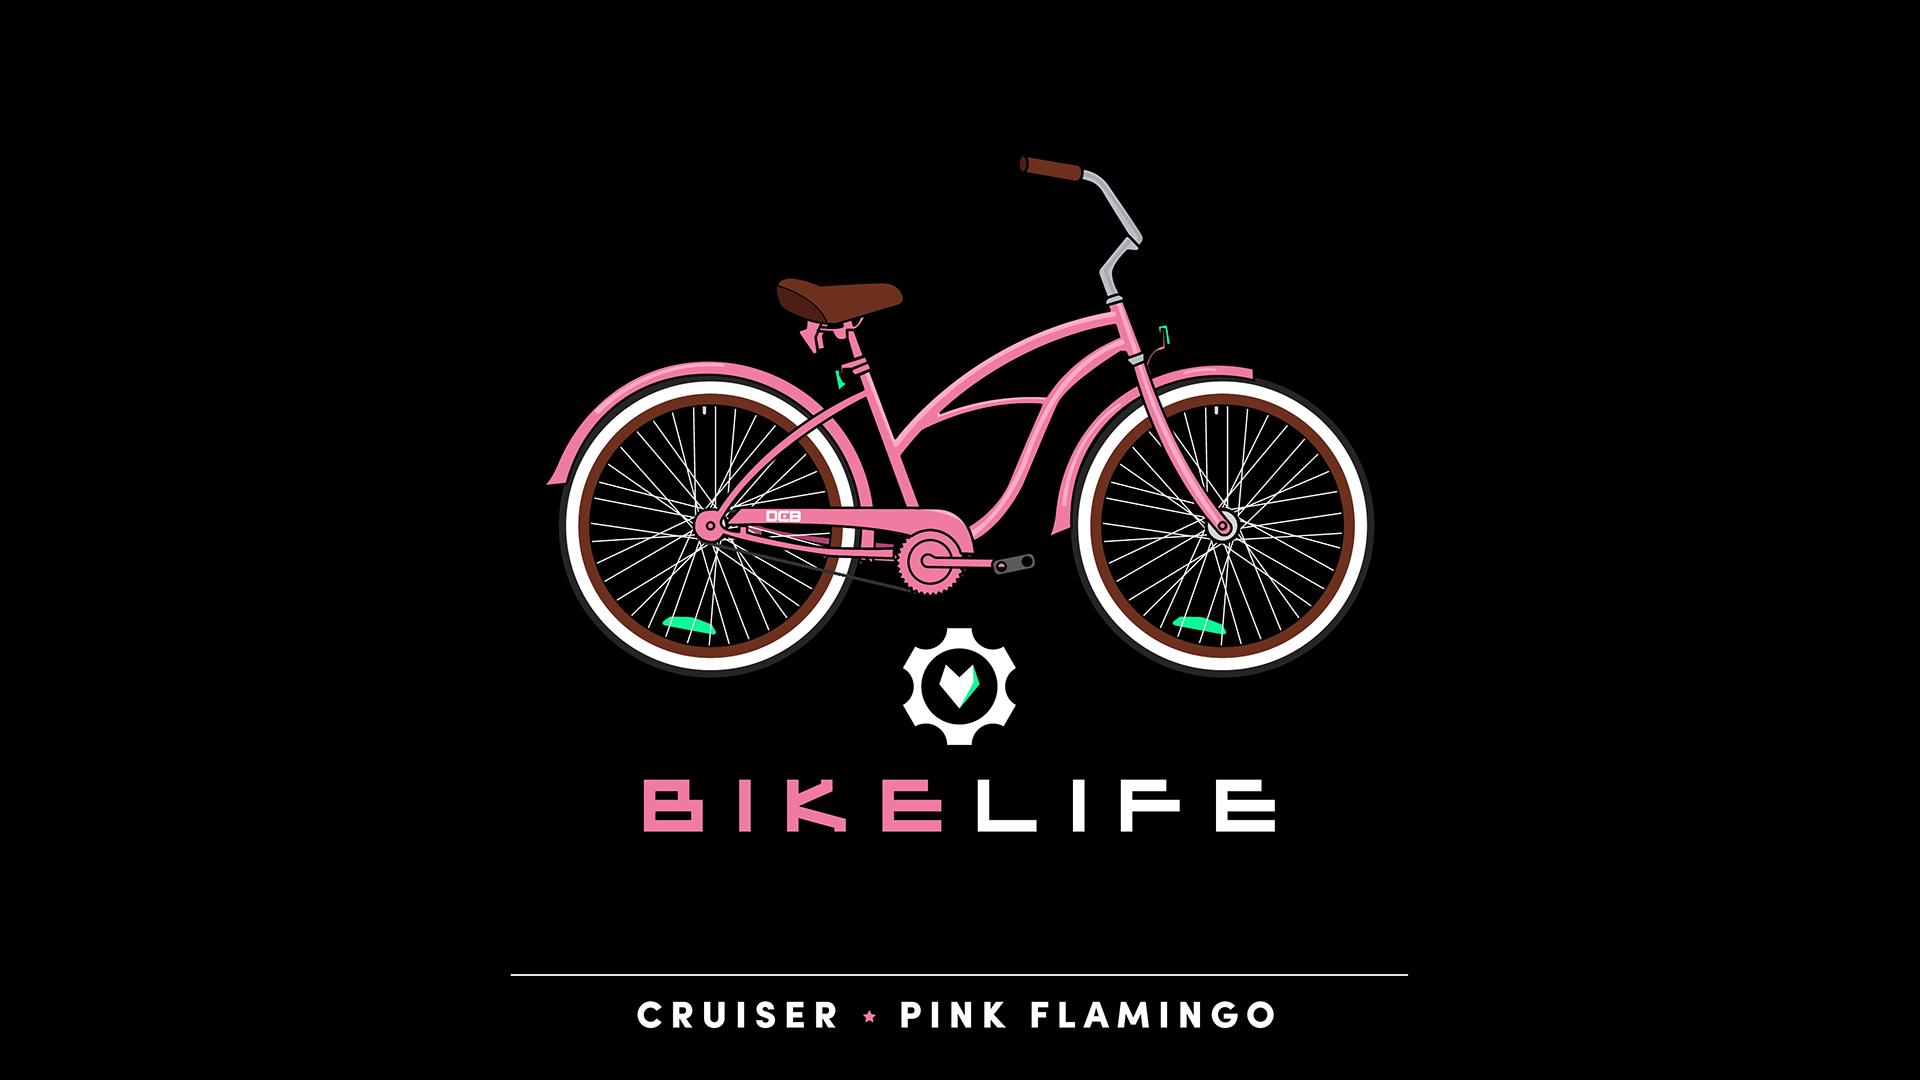 Bike Life Cruiser Pink Flamingo.jpg